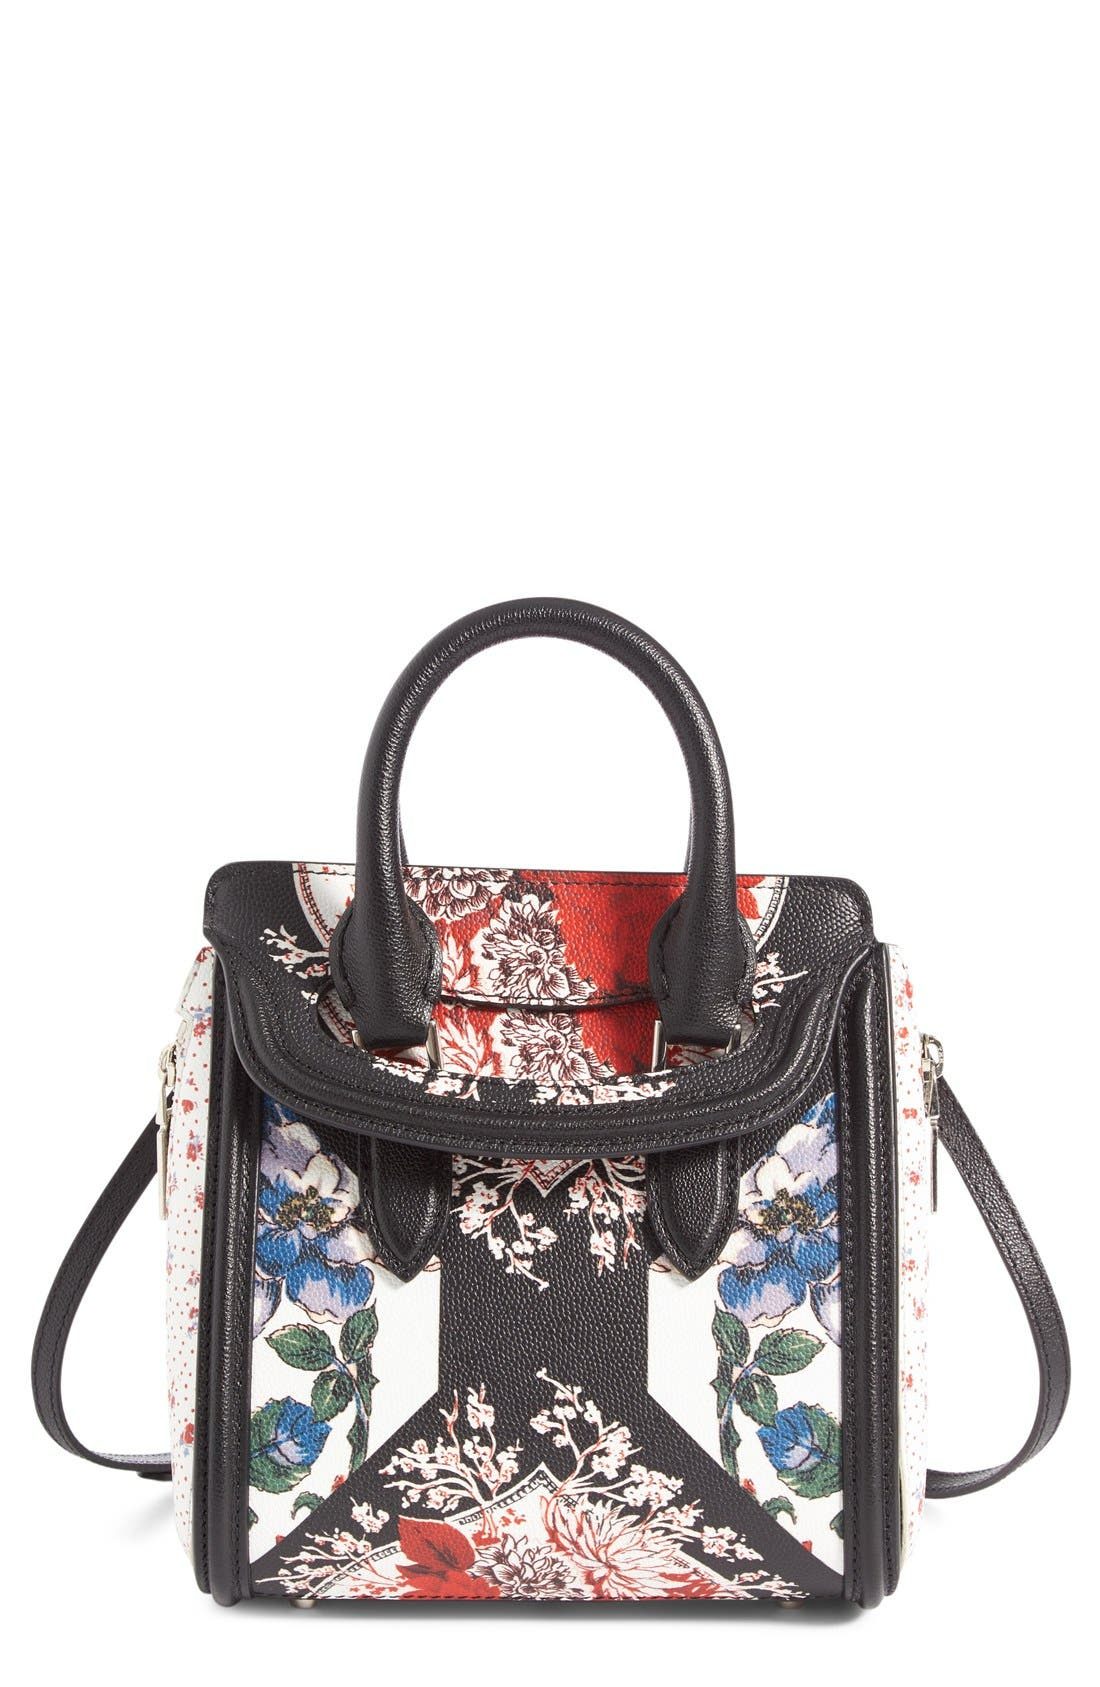 ALEXANDER MCQUEEN Mini Heroine Floral Print Calfskin Leather